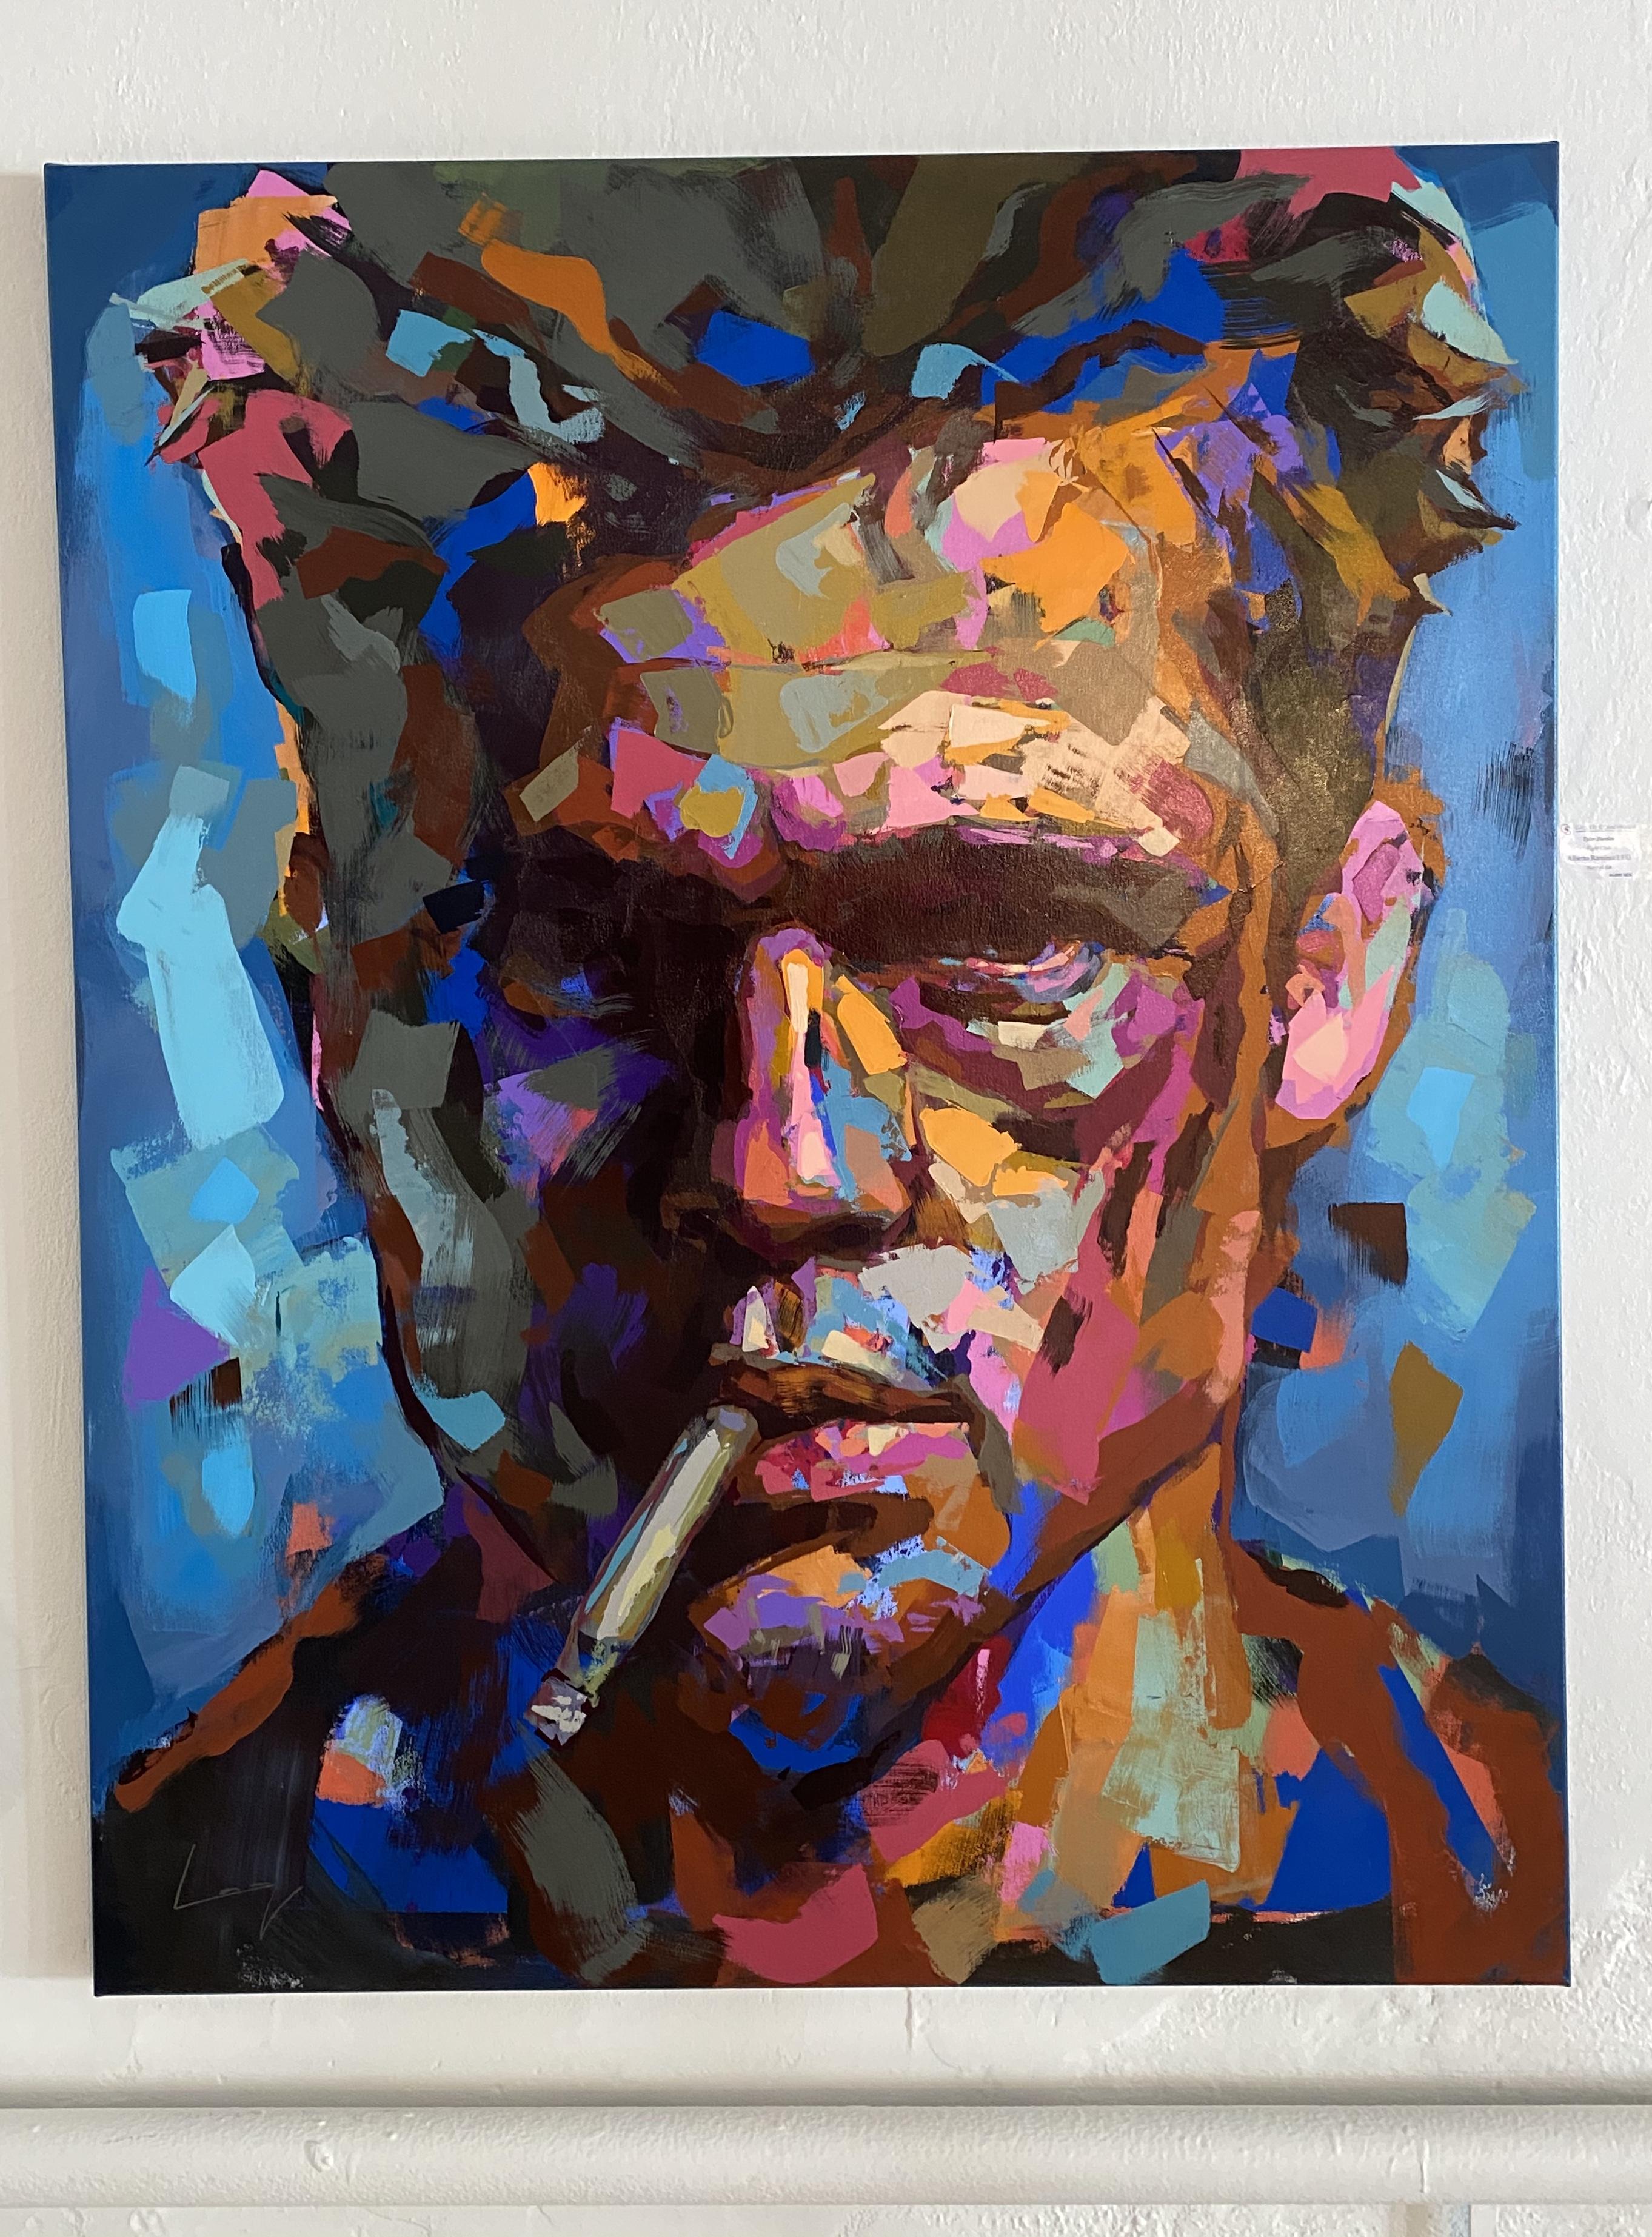 """Tyler Durden"" Akryl av Alberto Ramirez LEG. 160x140cm"